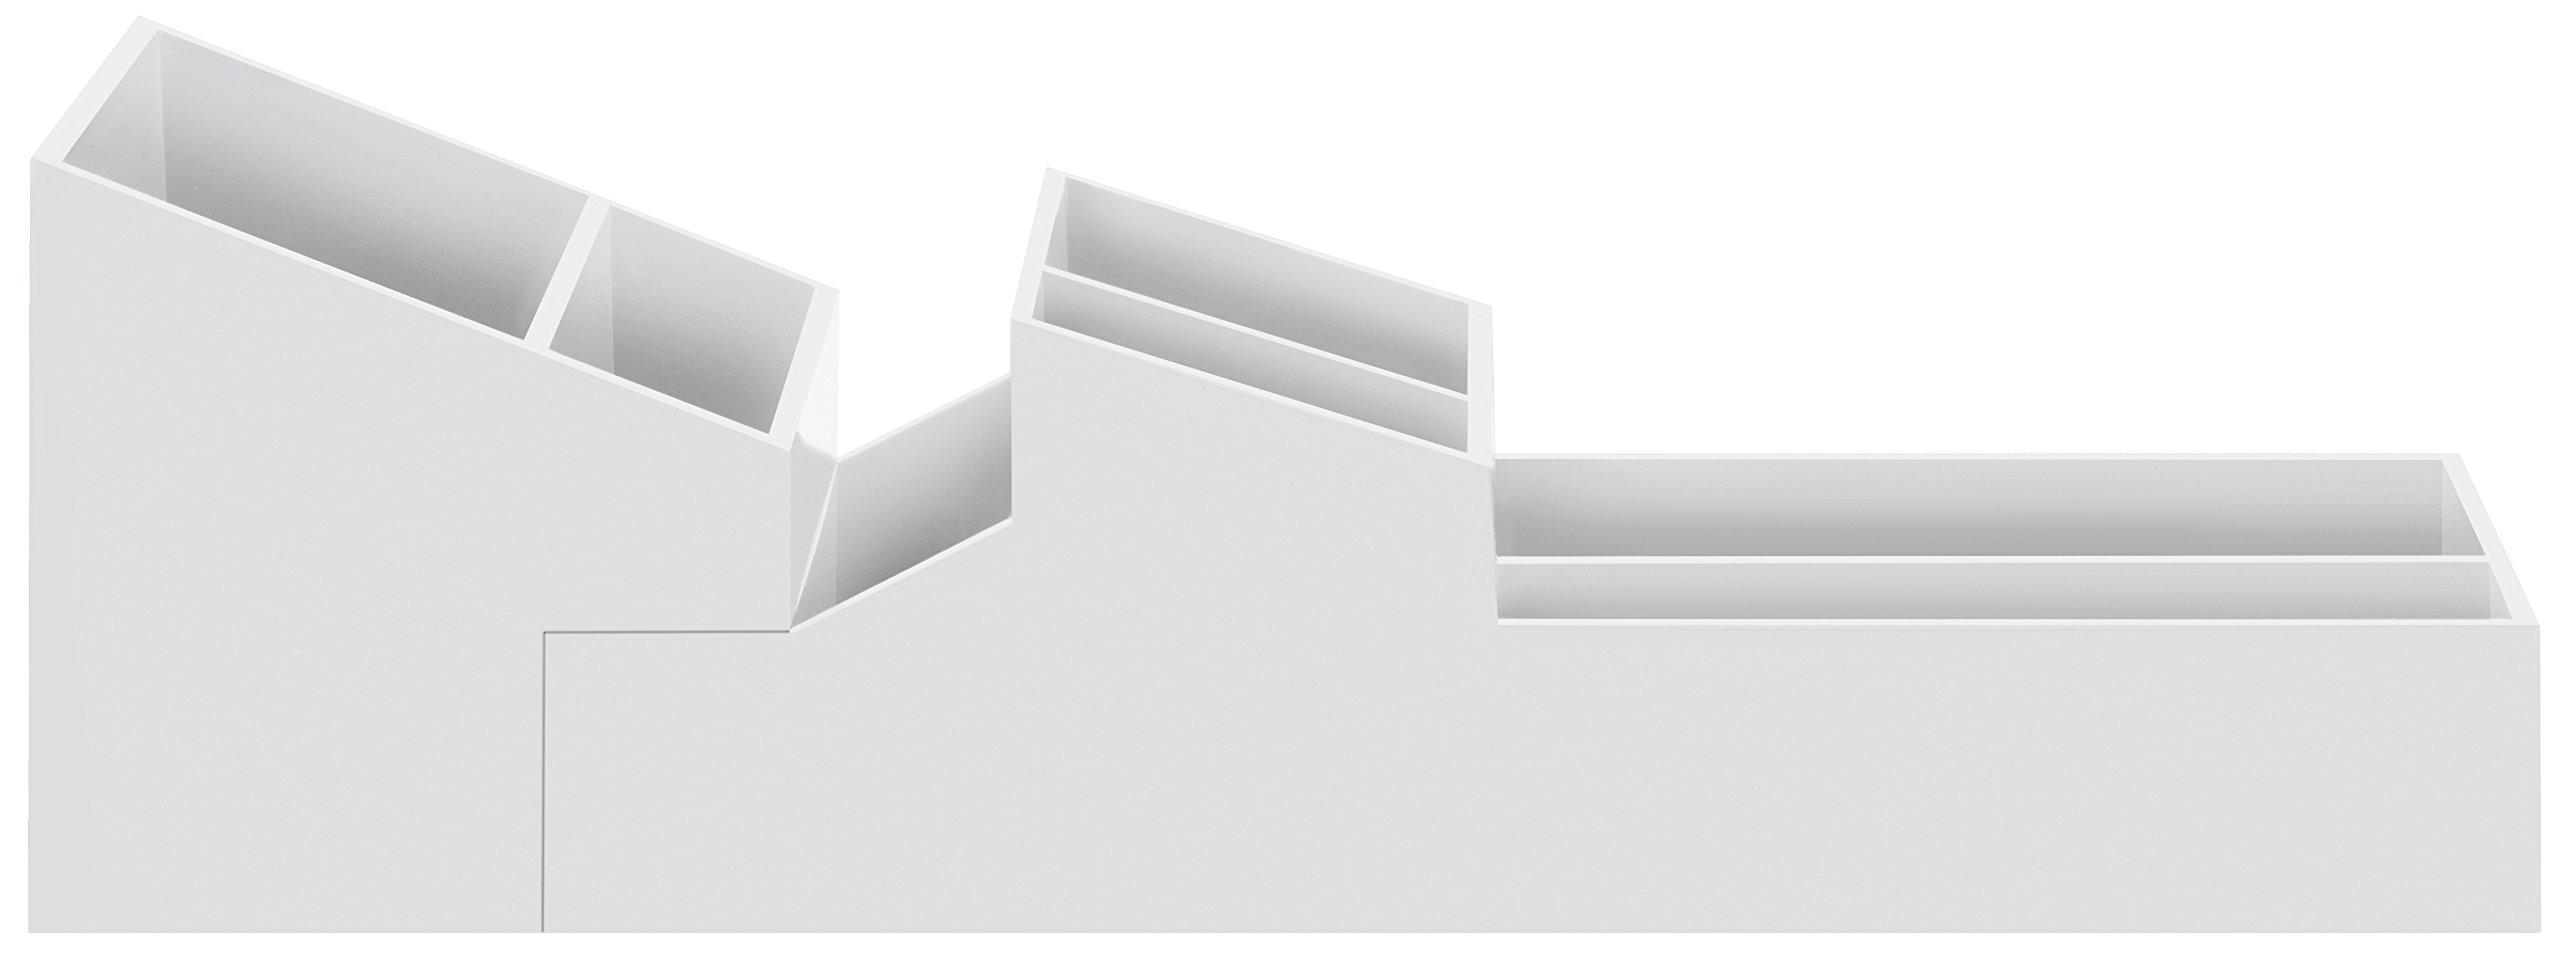 Spirella 10.19174Skyline White 7Litre 2-Piece Bathroom Accessory, Plastic, White, 8/5x 30cm